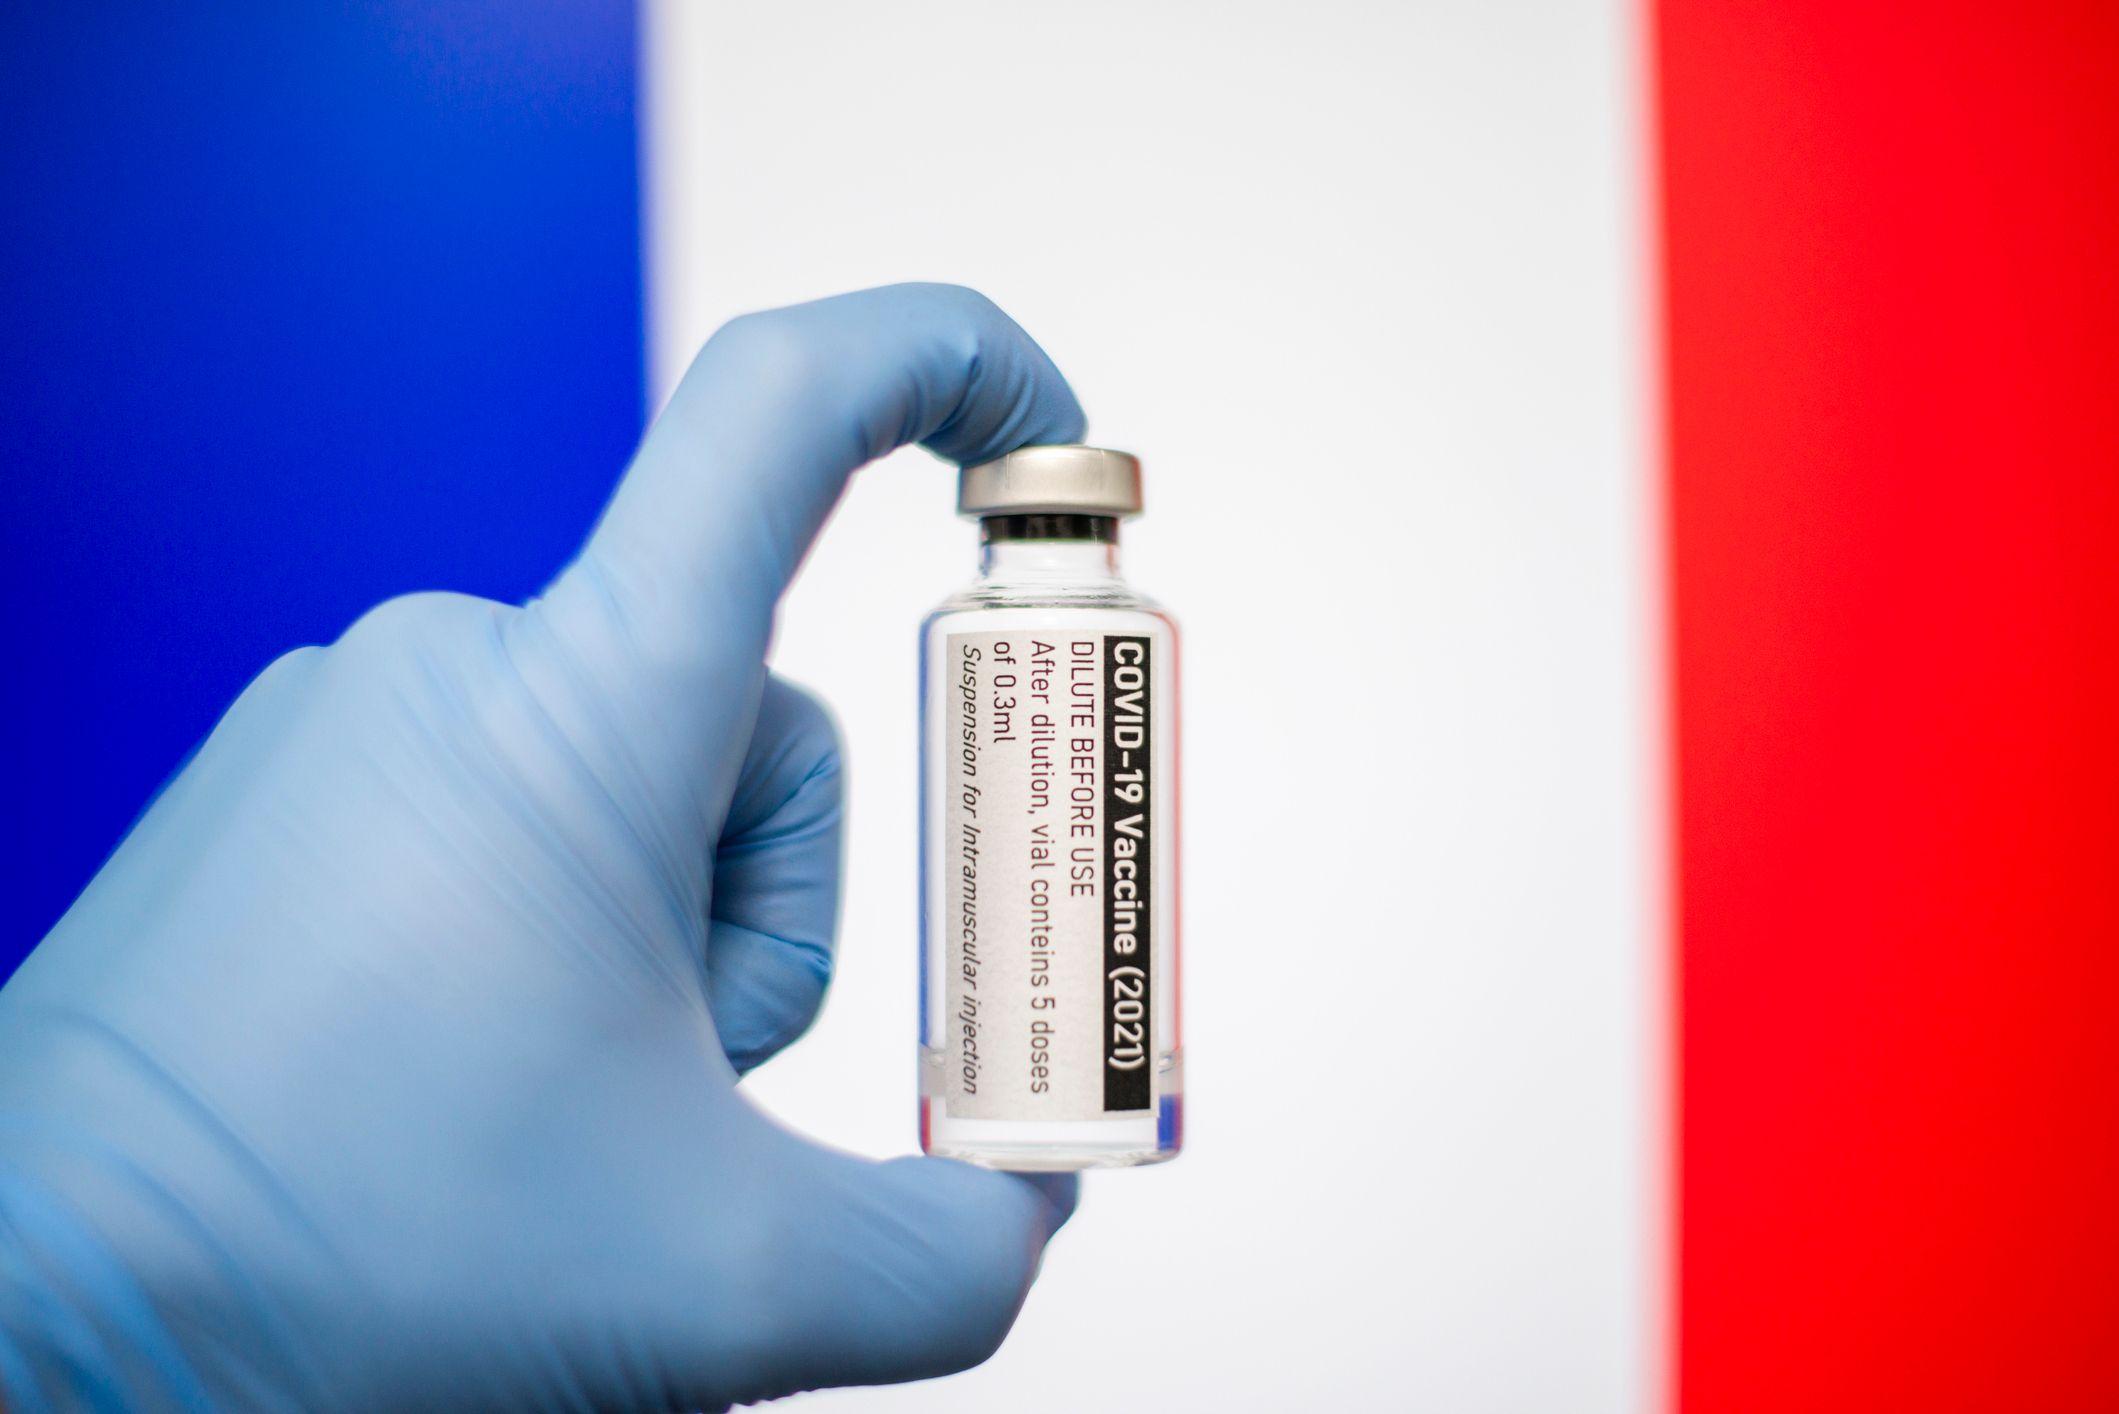 Une dose de vaccin contre le